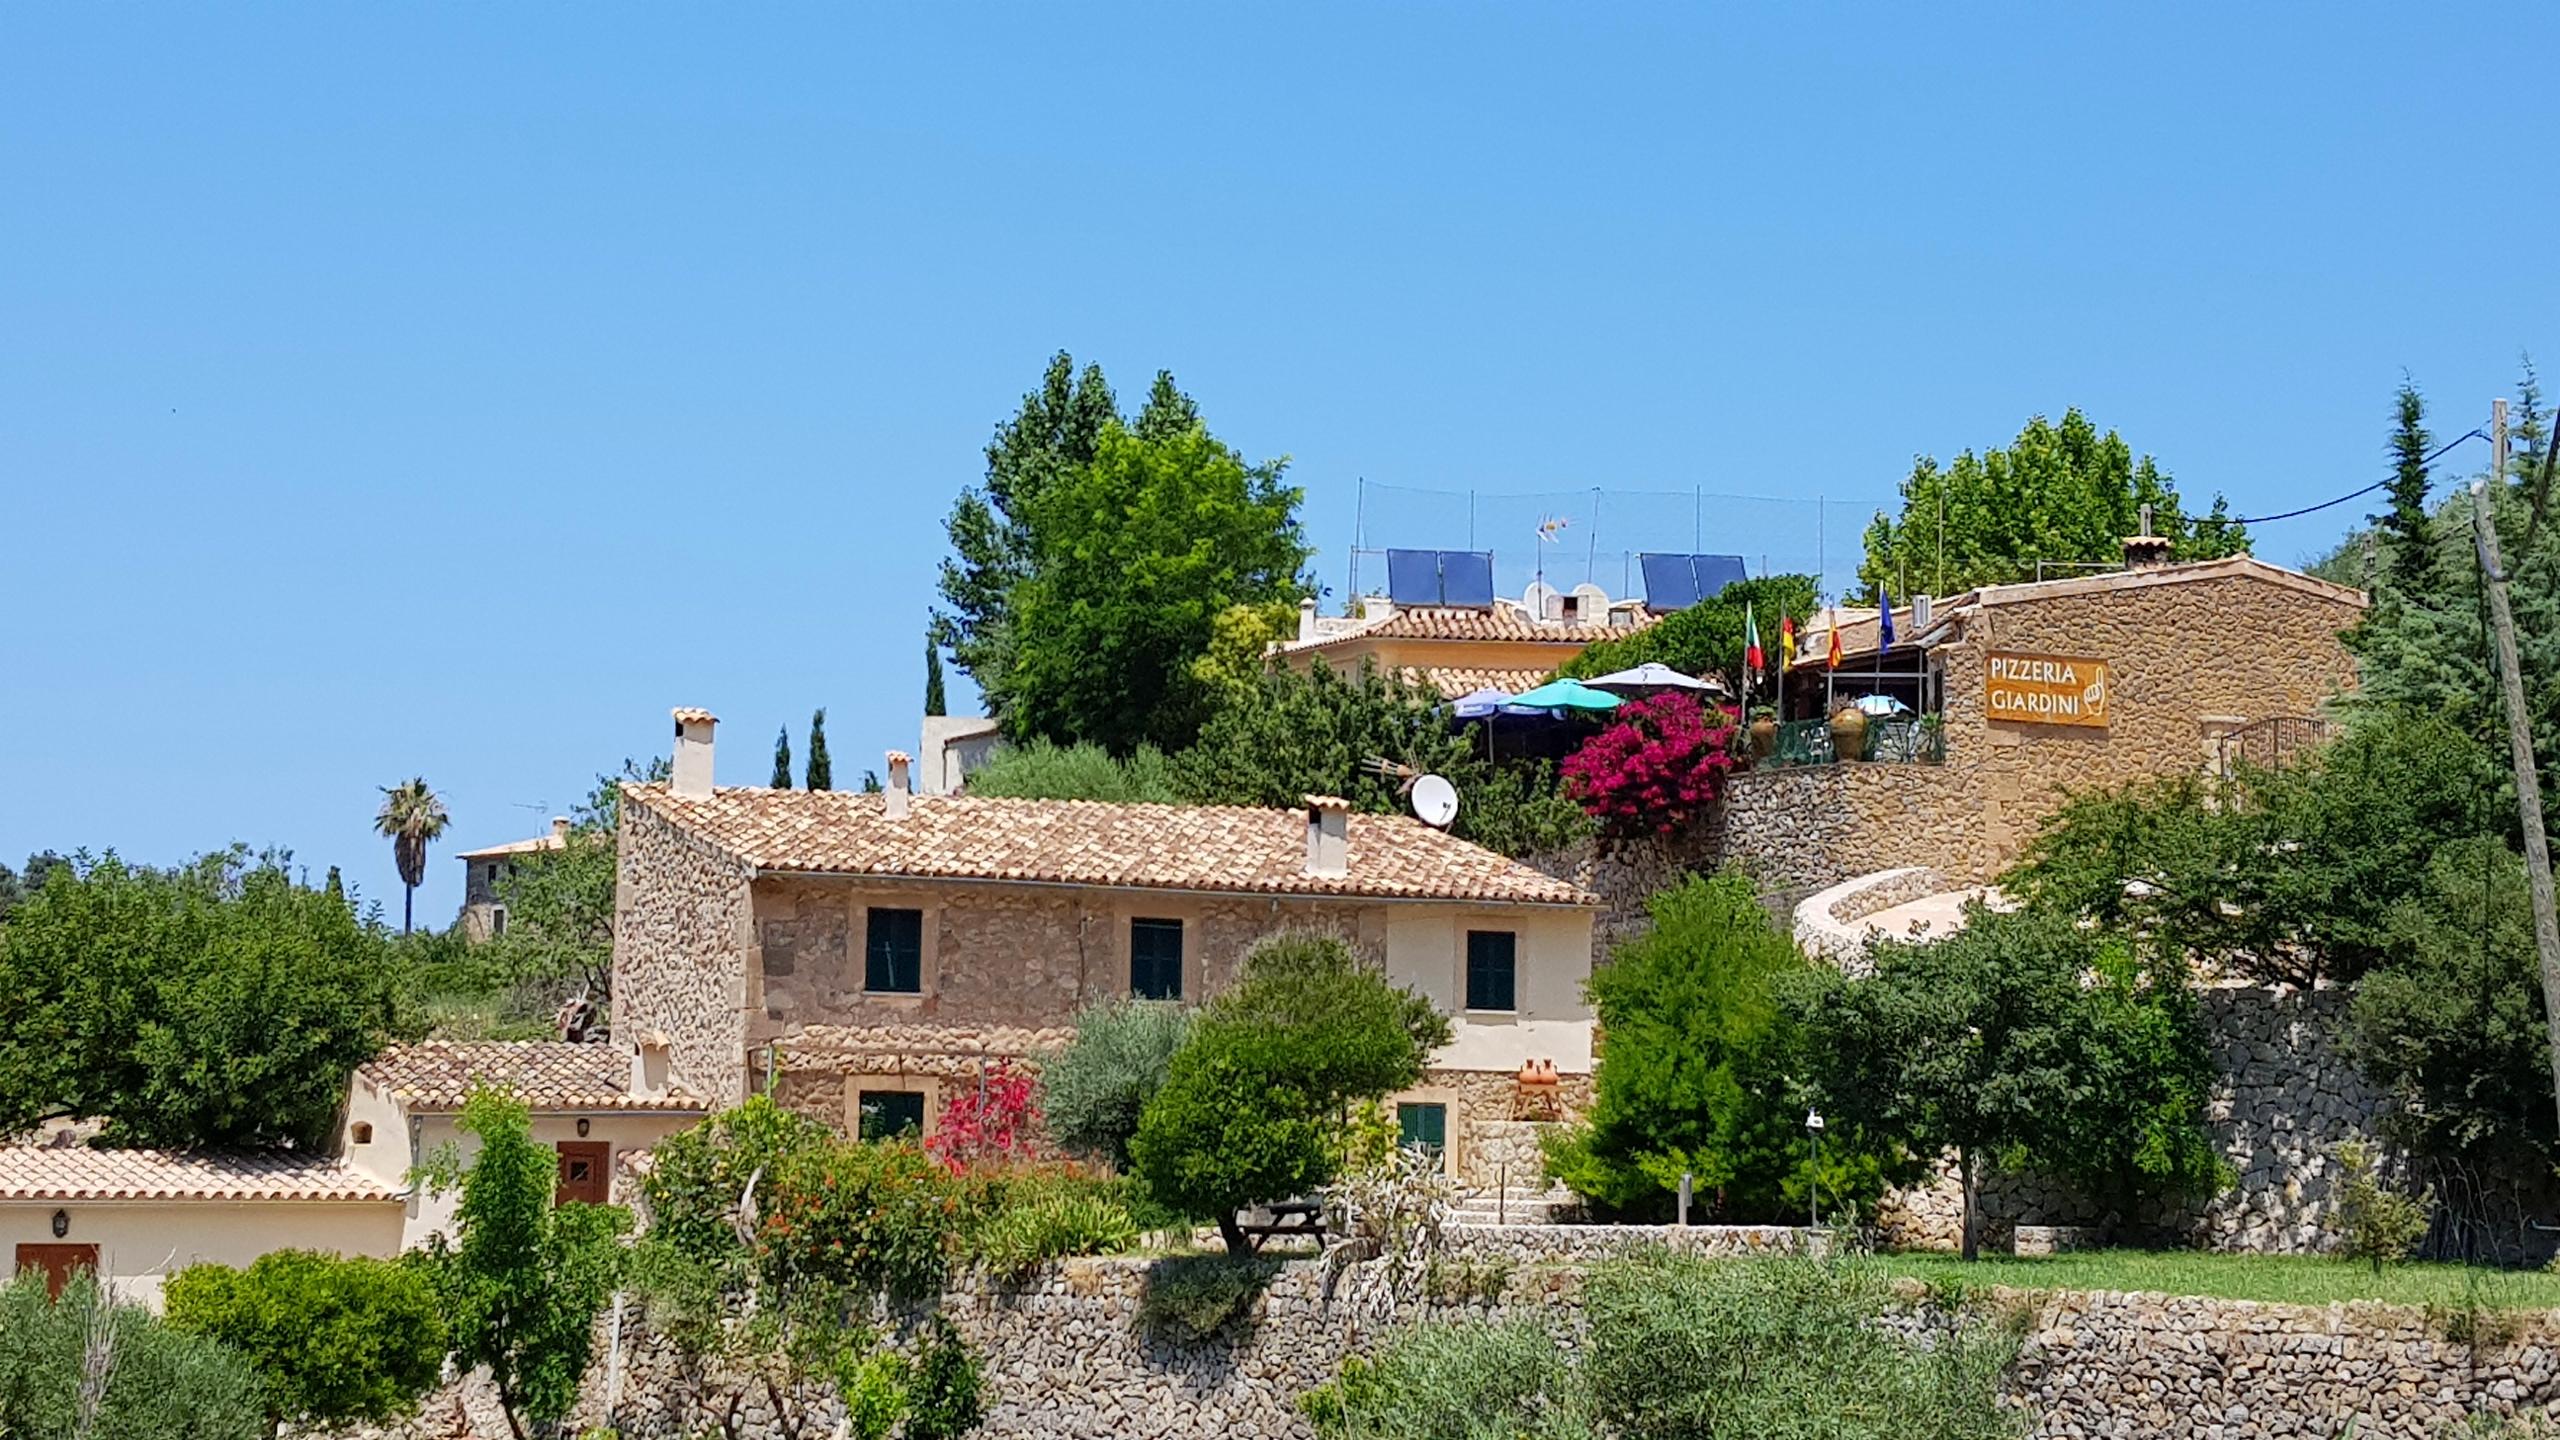 Lunsjstopp på biltur på Mallorca